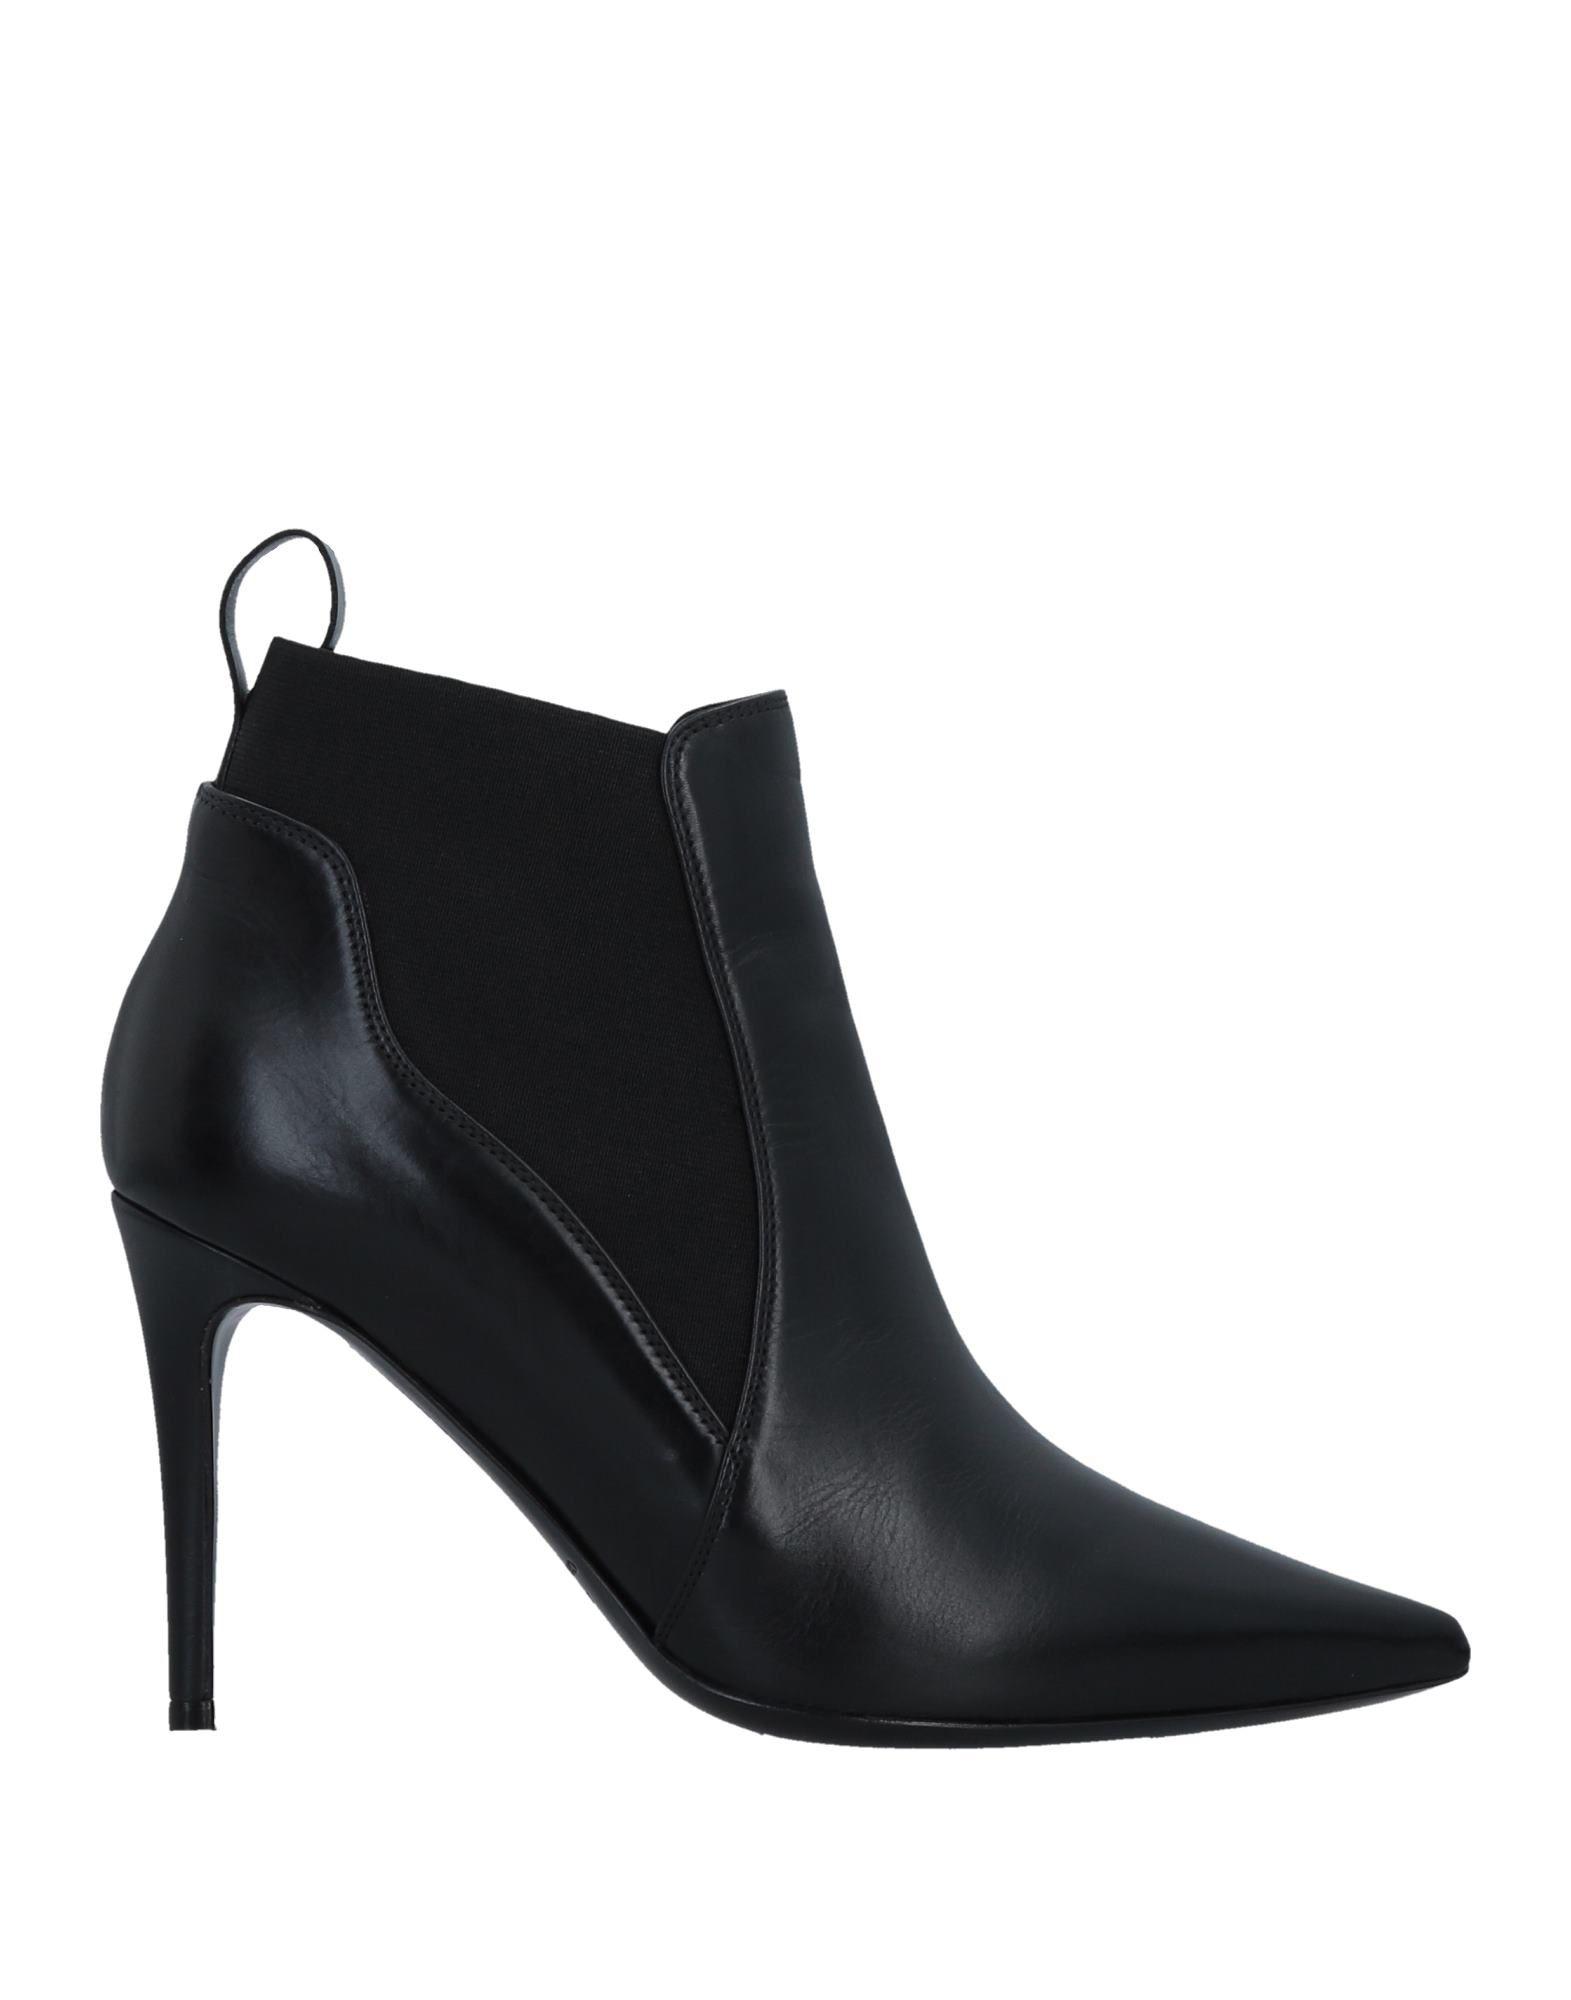 Fratelli Women Karida Ankle Boot - Women Fratelli Fratelli Karida Ankle Boots online on  Australia - 11503025LR a08bb6